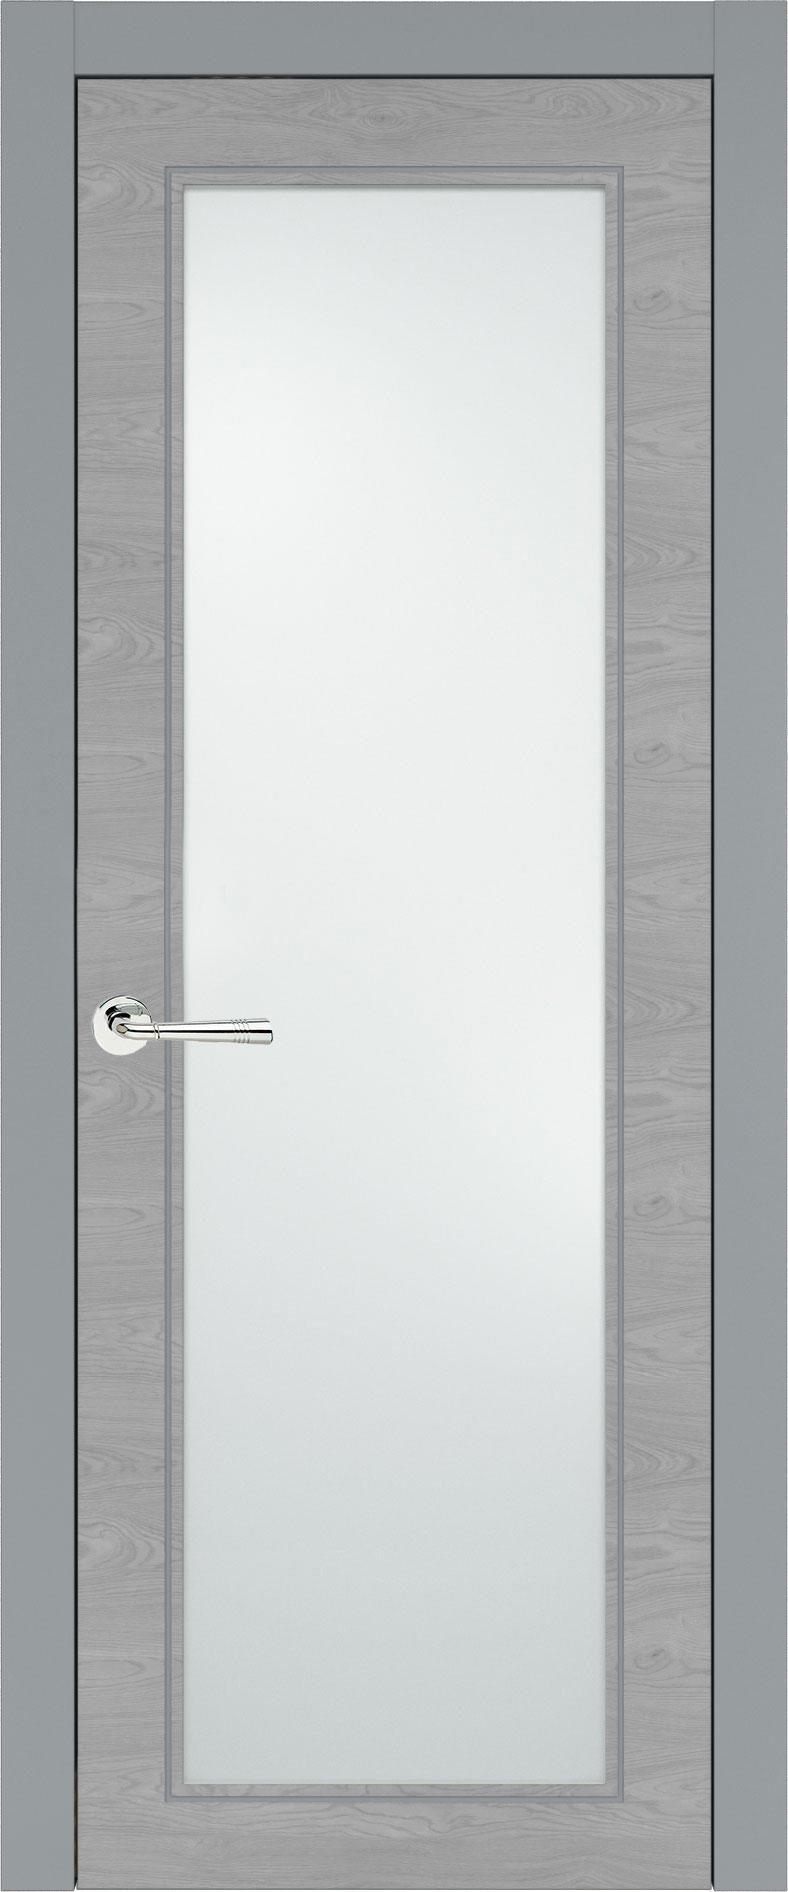 Domenica Neo Classic цвет - Серебристо-серая эмаль по шпону (RAL 7045) Со стеклом (ДО)